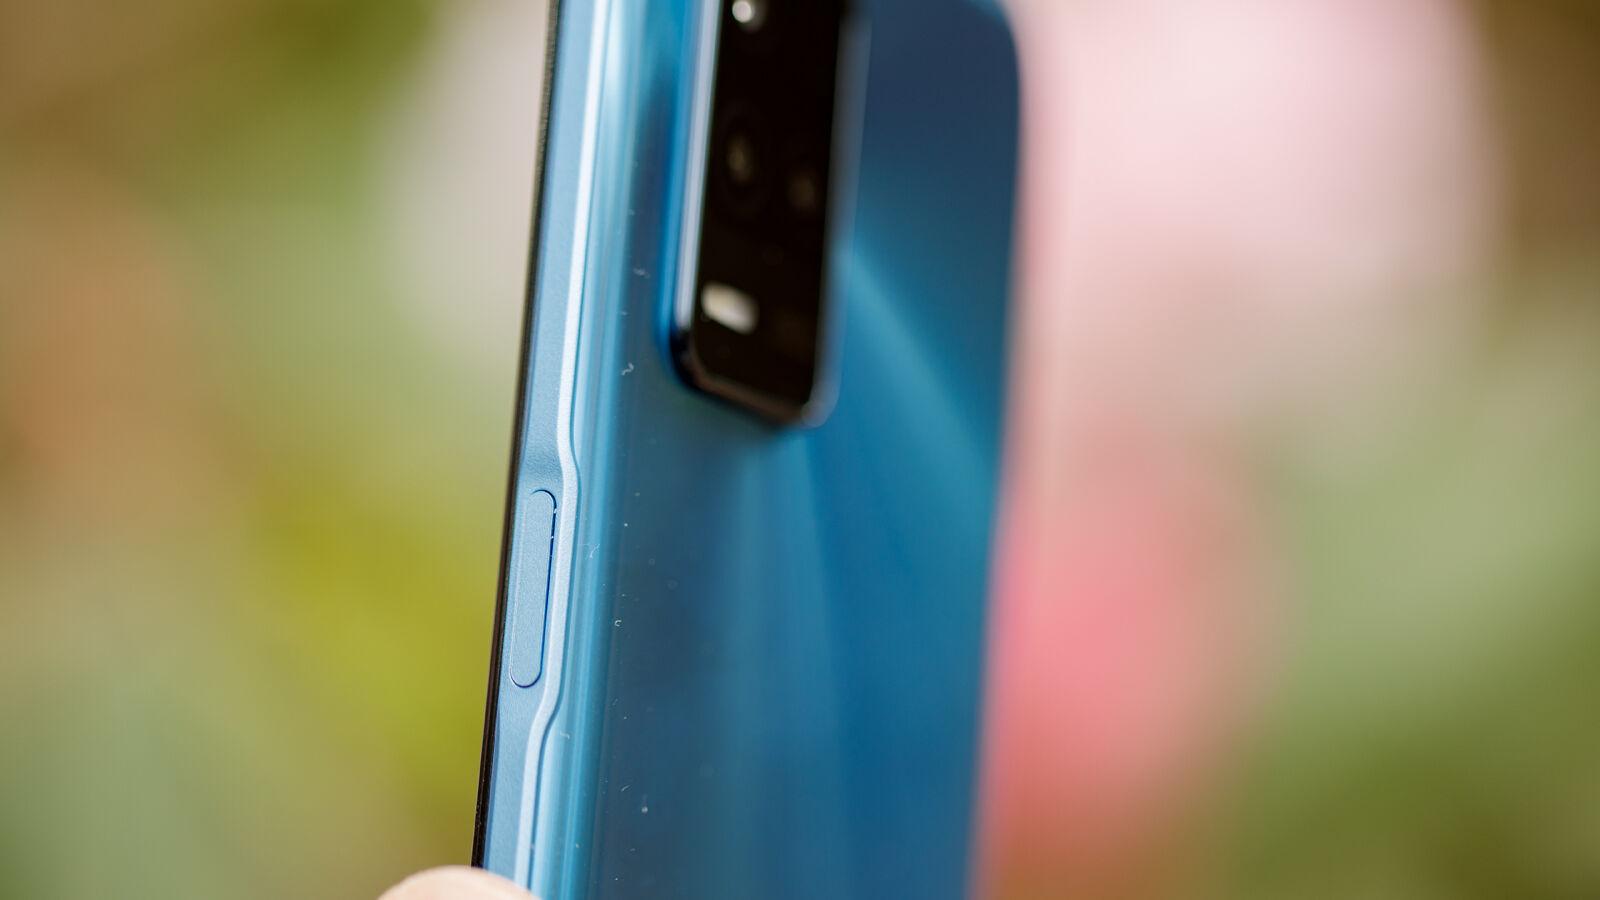 Realme 8 5G fingerprint sensor